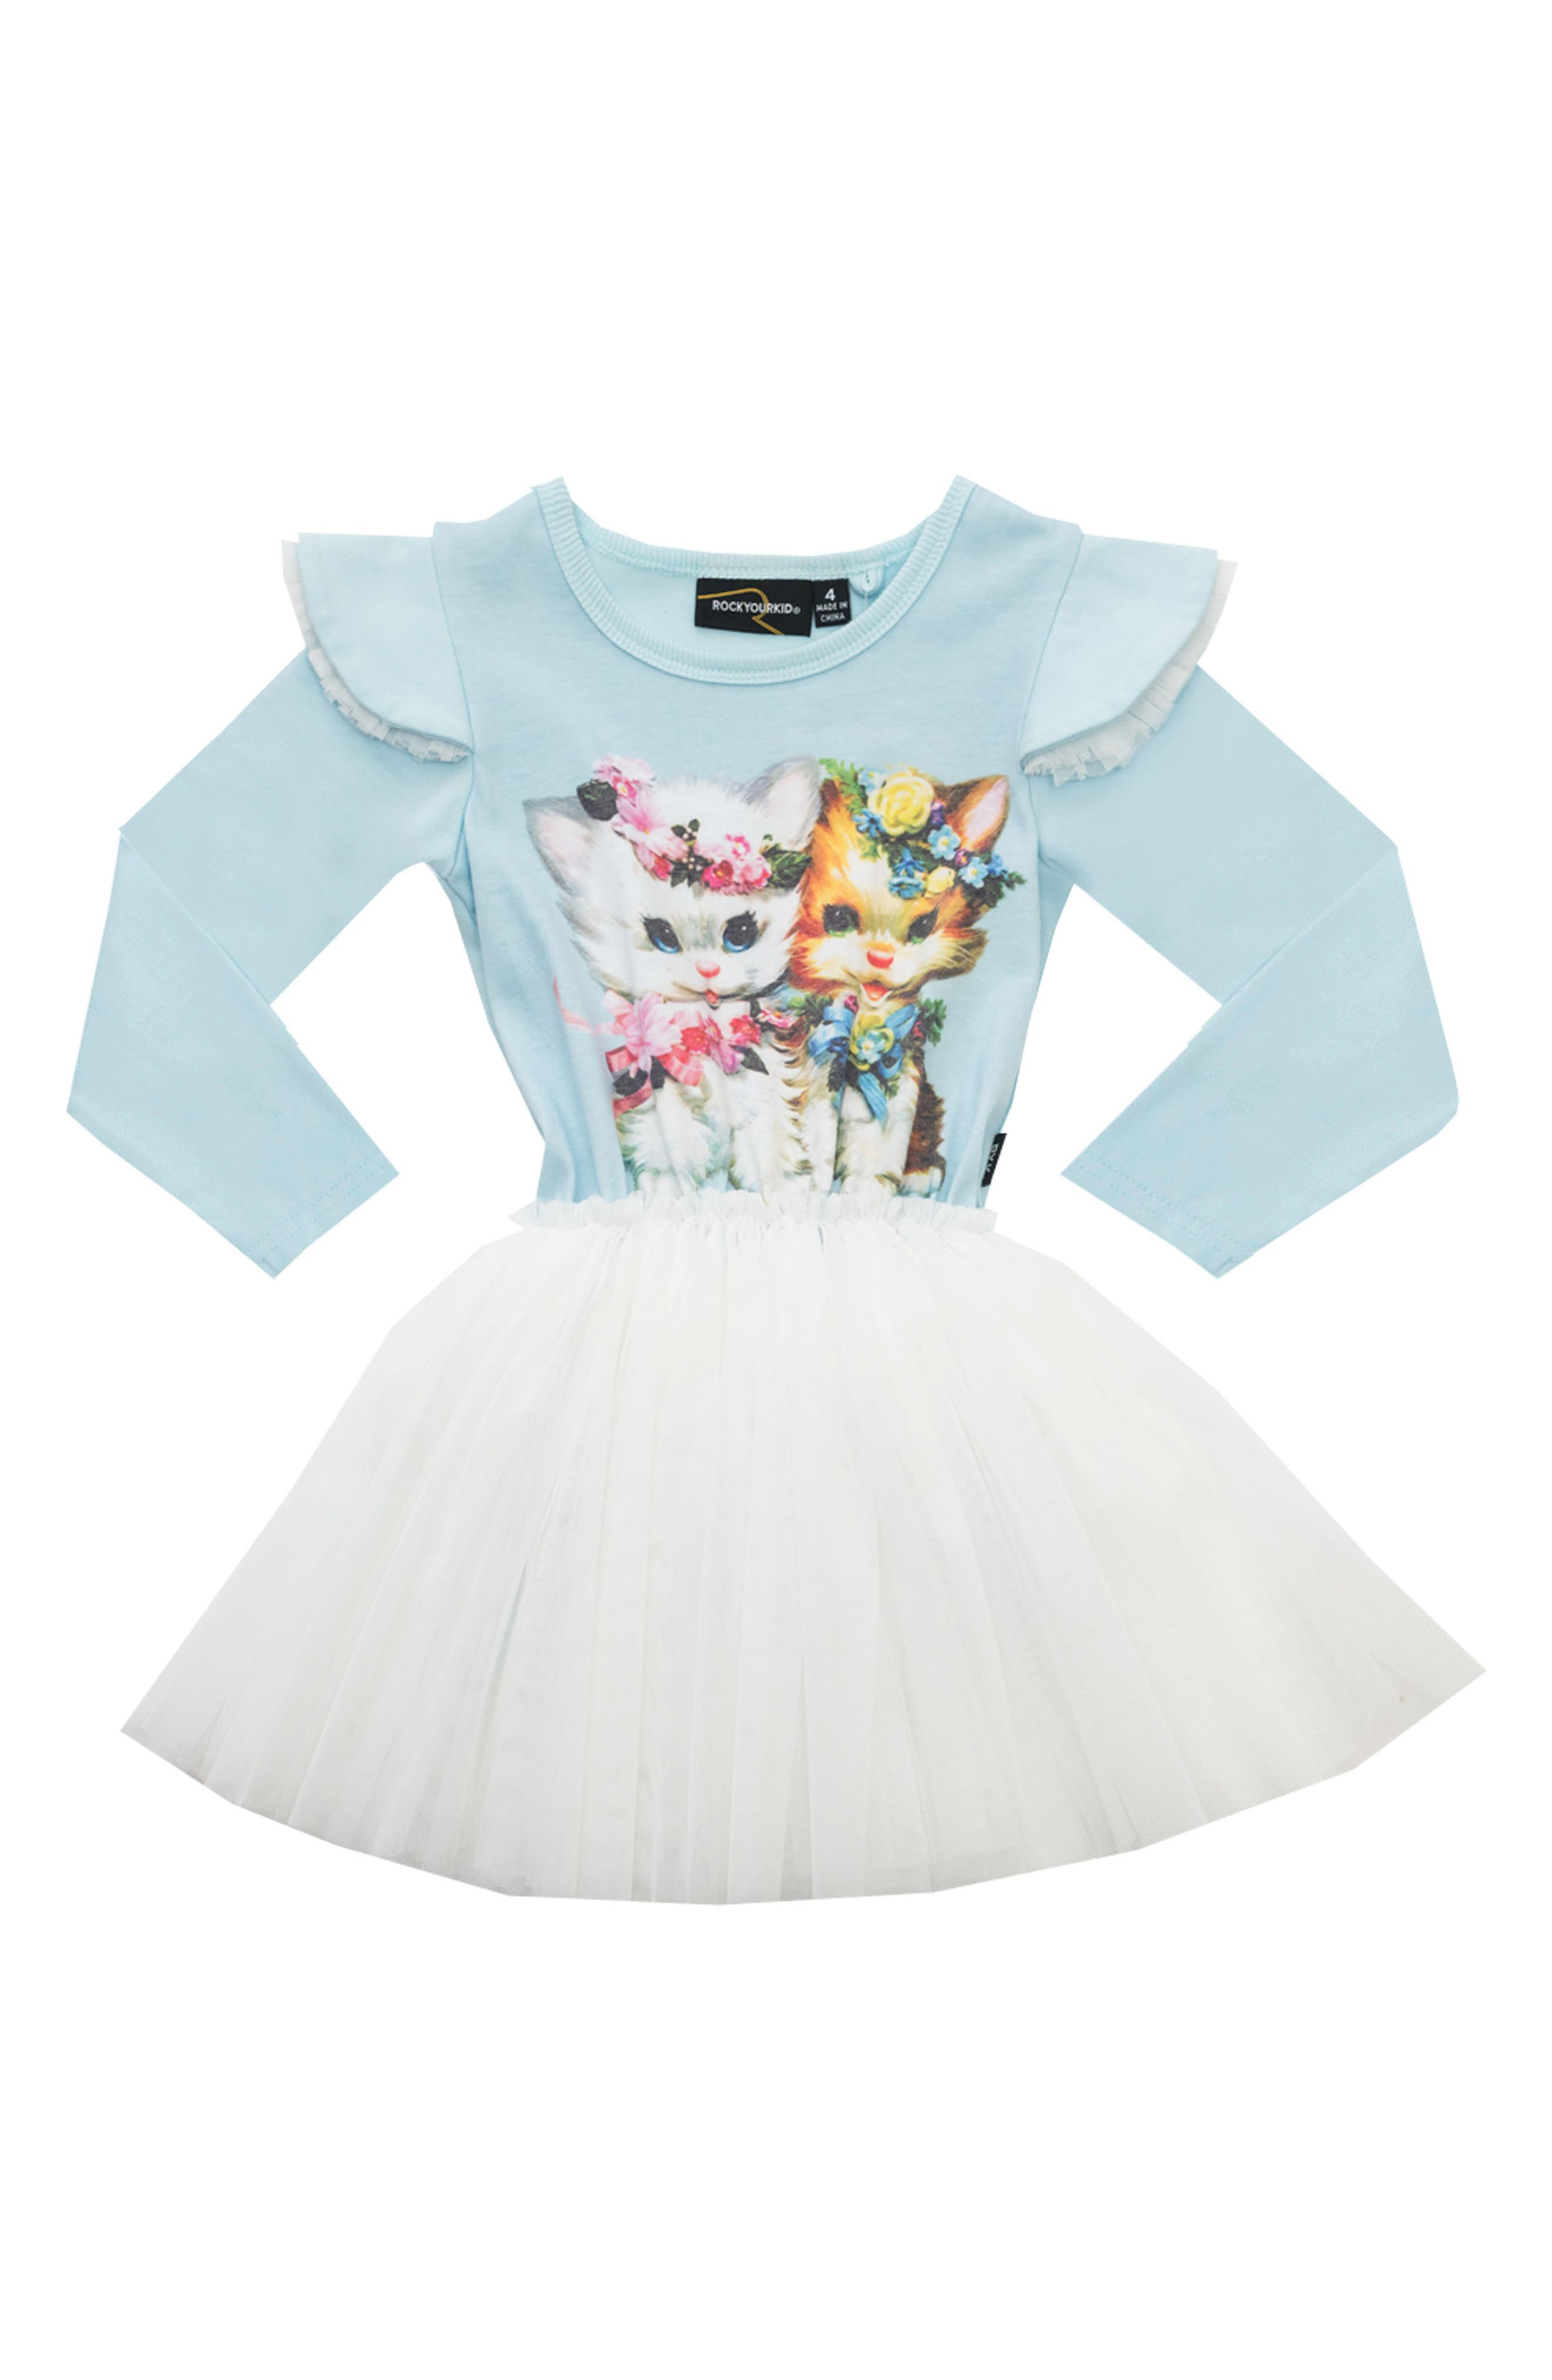 Alternate Image 1 Selected - Rock Your Kid Lulu & Lola Circus Dress (Toddler Girls & Little Girls)